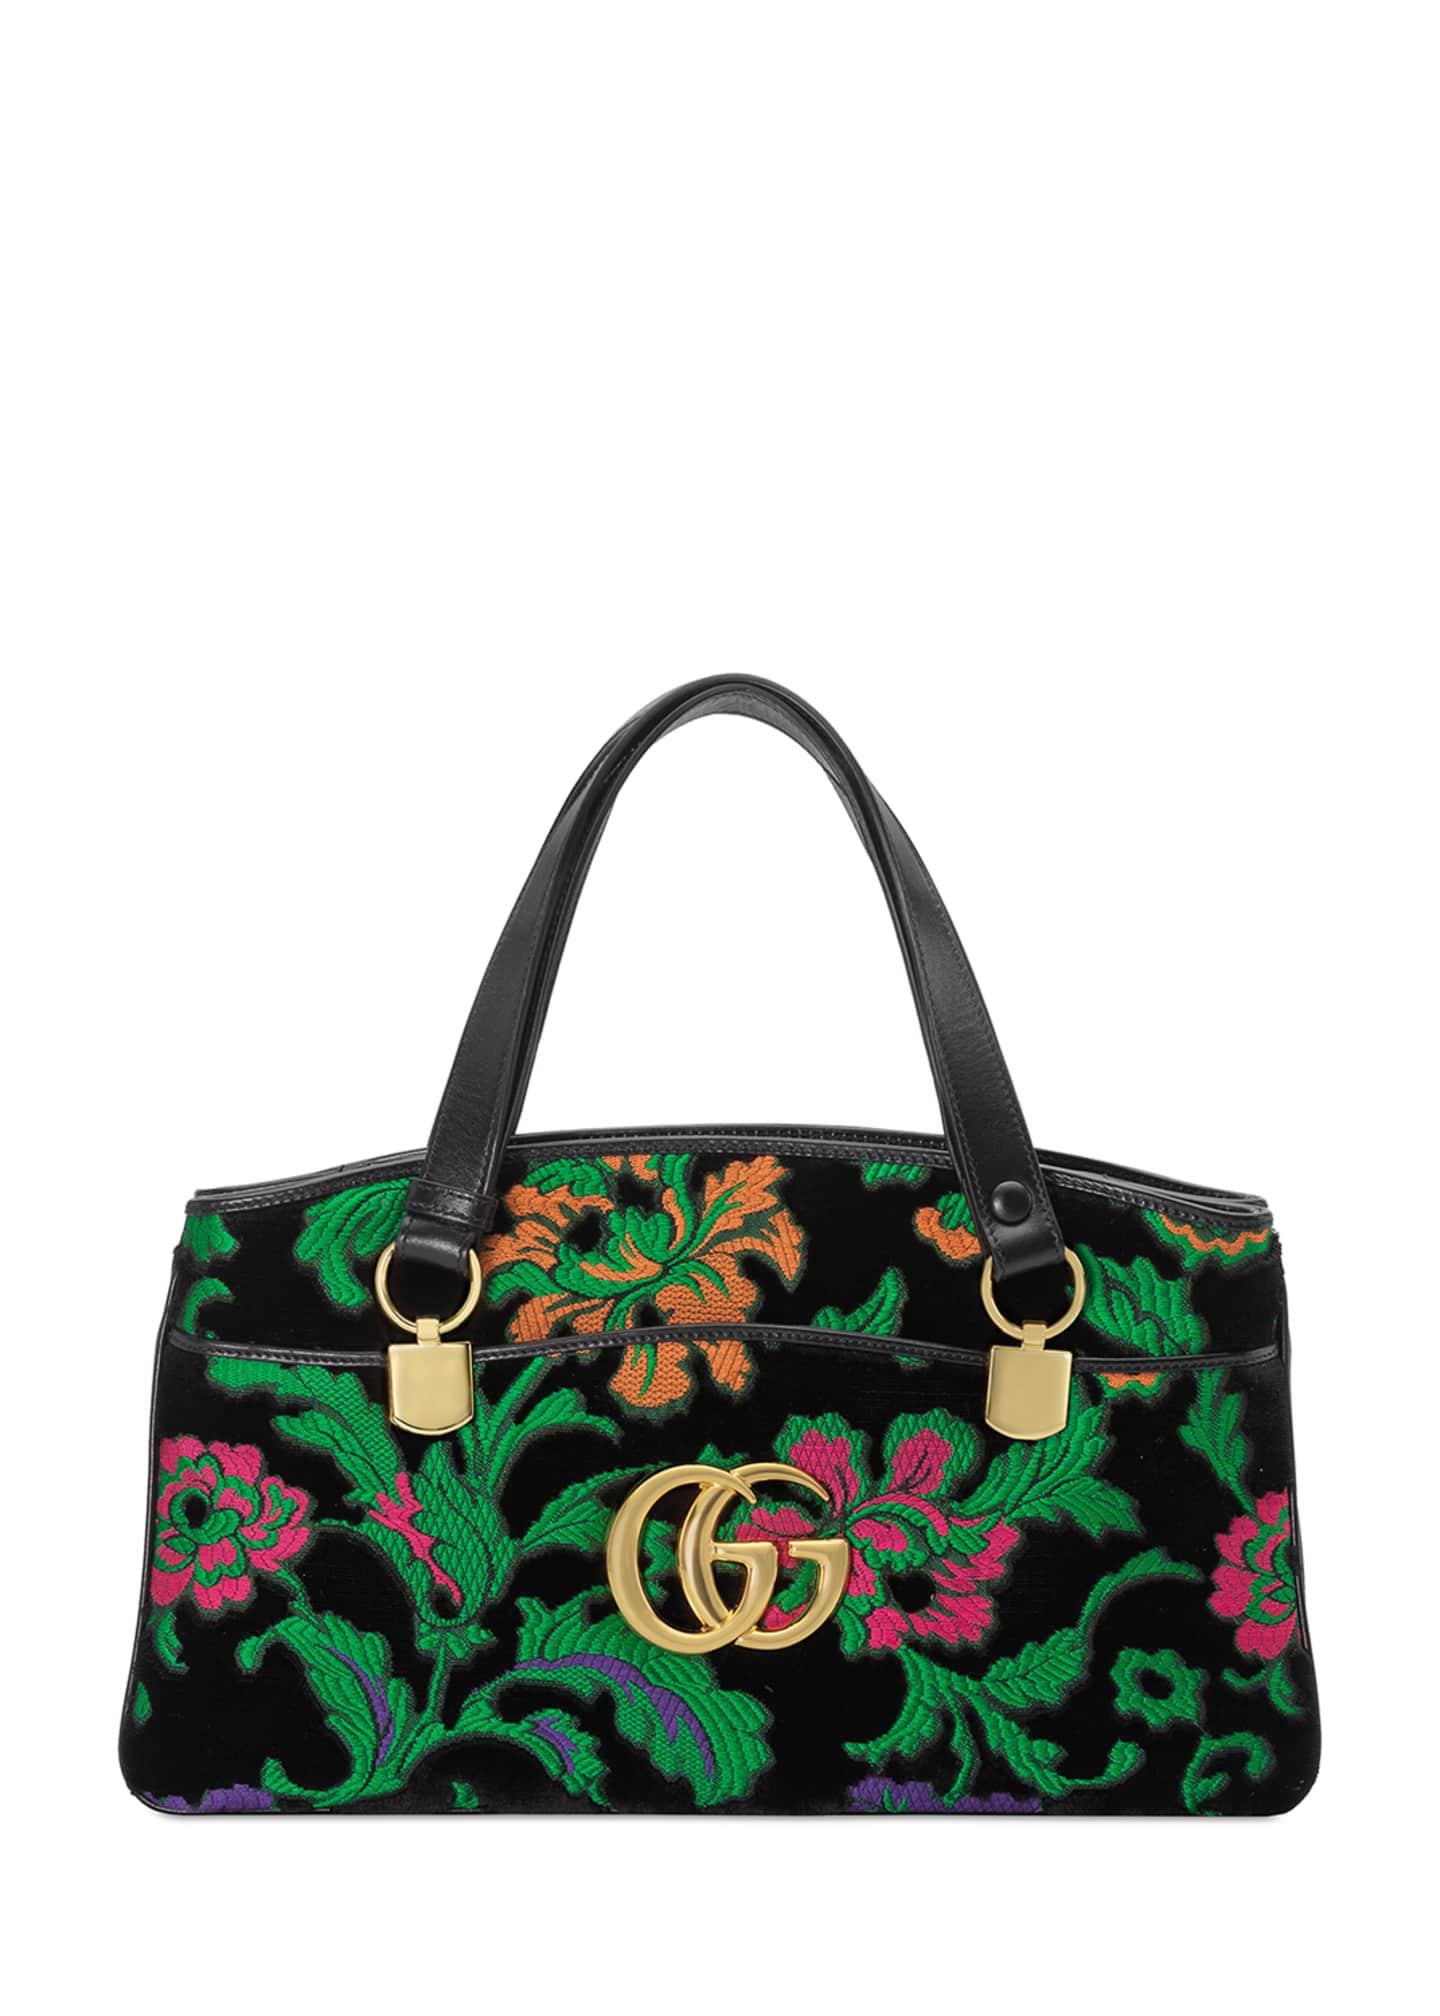 Gucci Arli Medium Velvet Top-Handle Bag